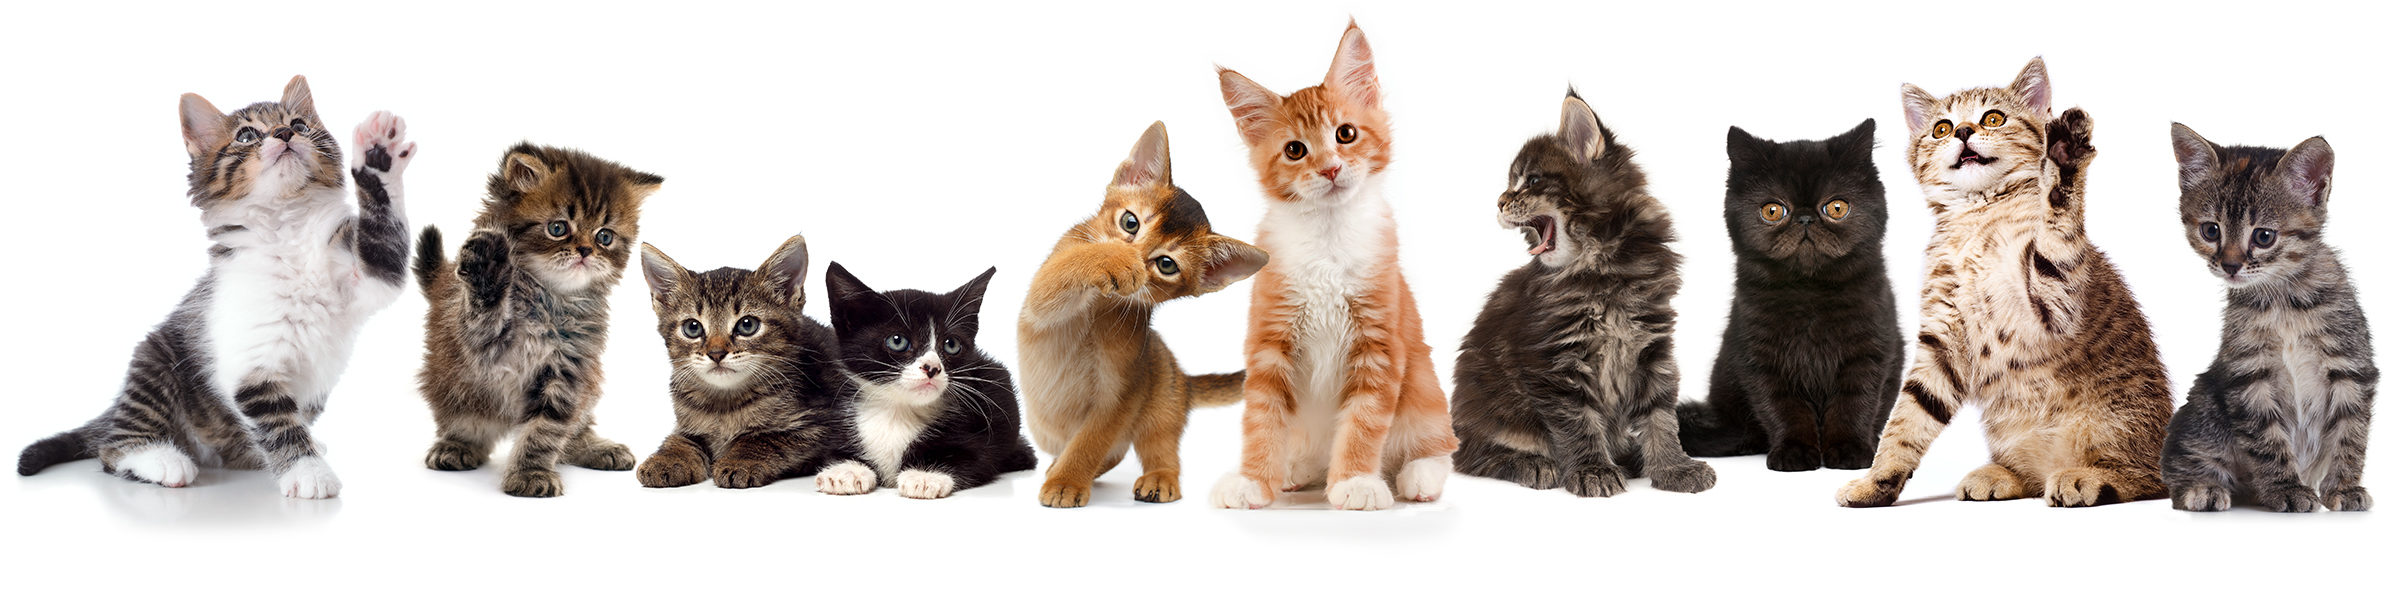 Ten kittens